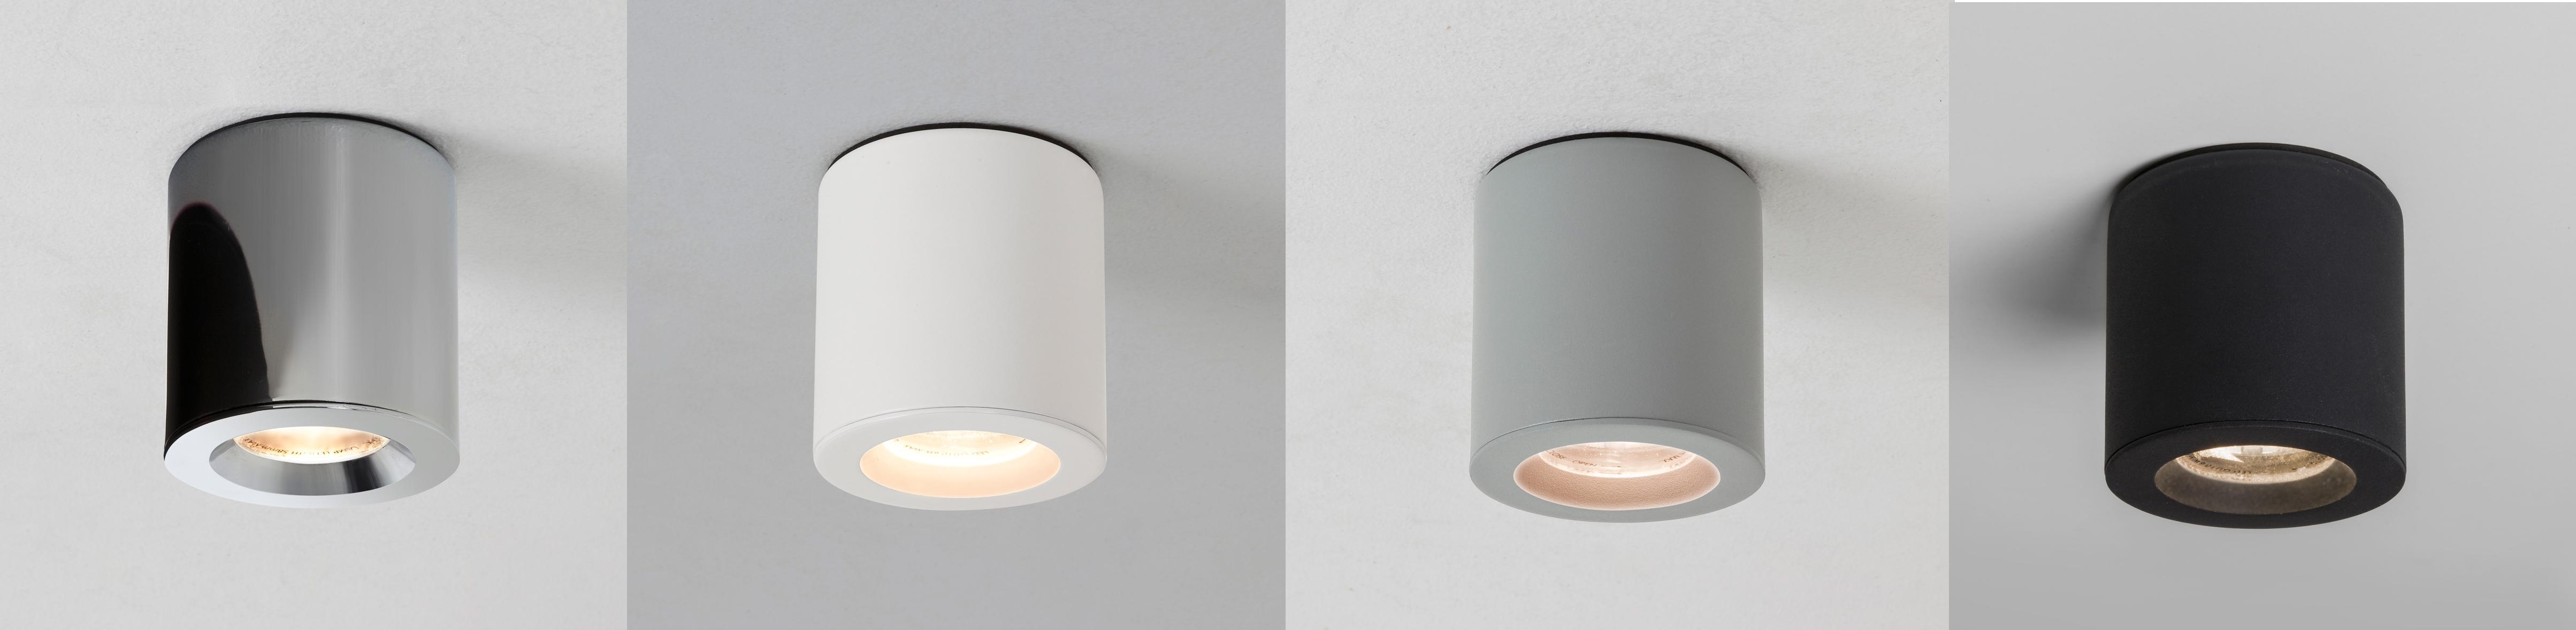 Bathroom Ceiling Light Zone 1 astro kos ip65 zone 1 surface mounted led bathroom round downlight